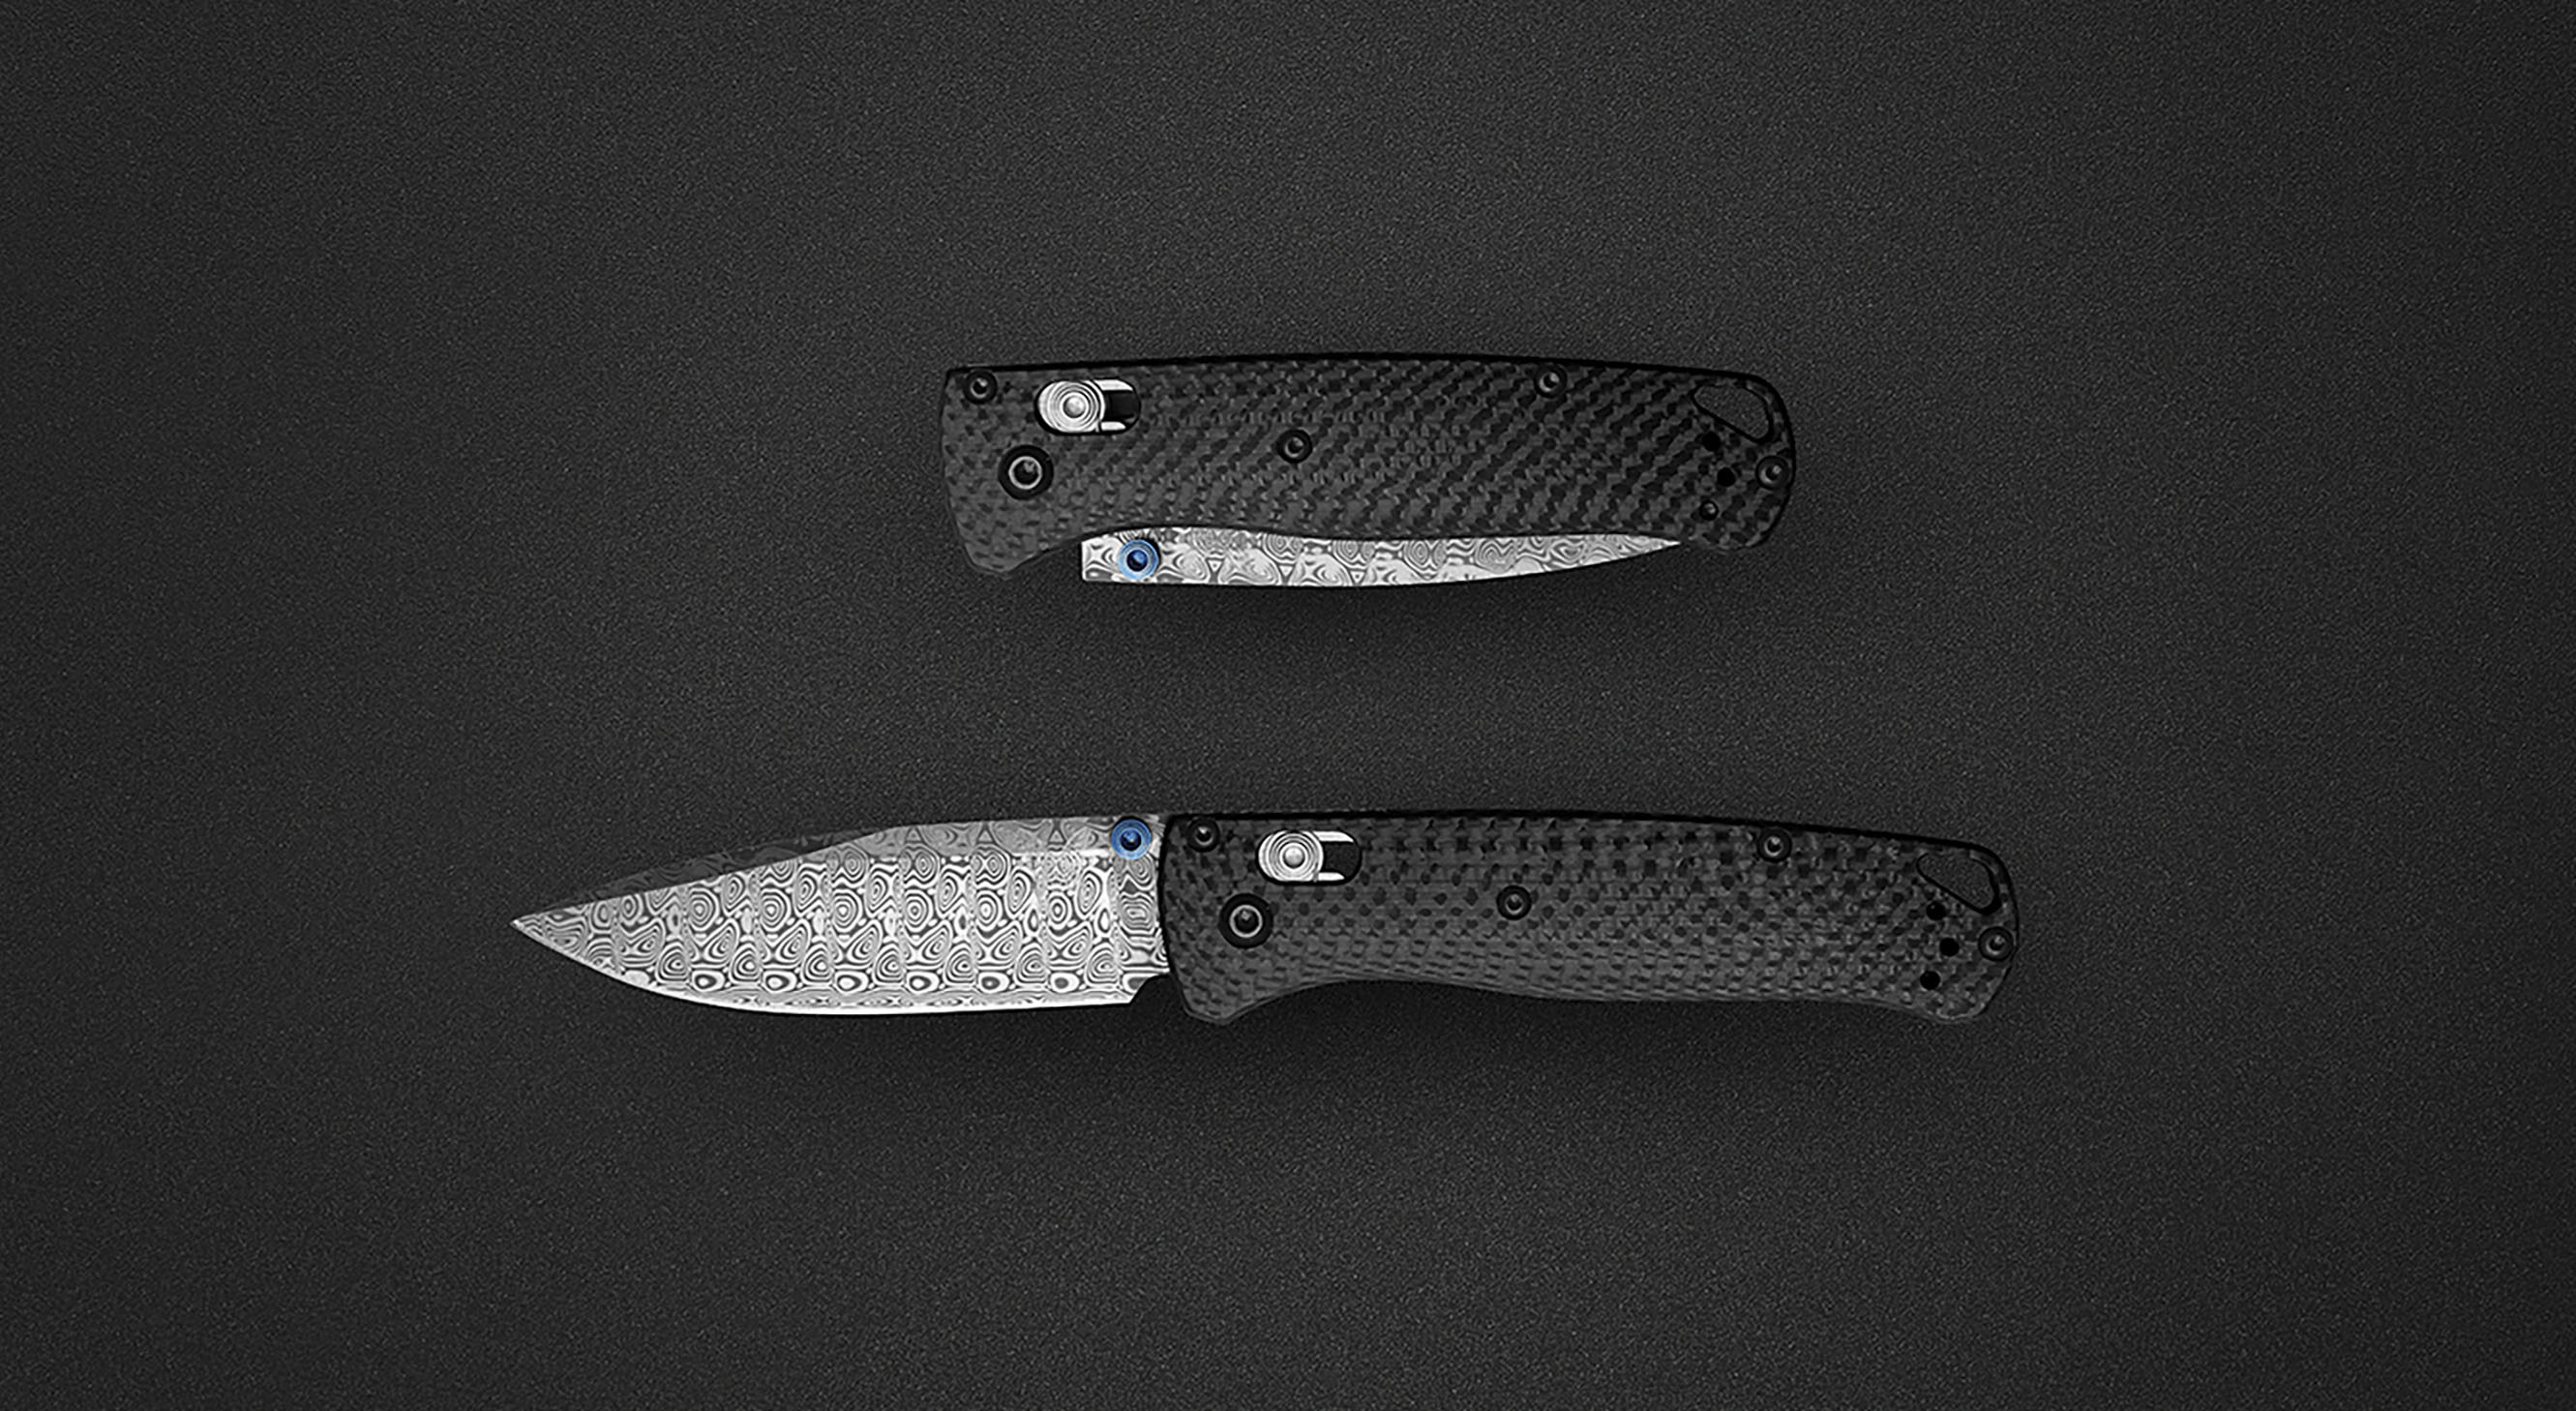 Benchmade Bugout custom knife builder damasteel